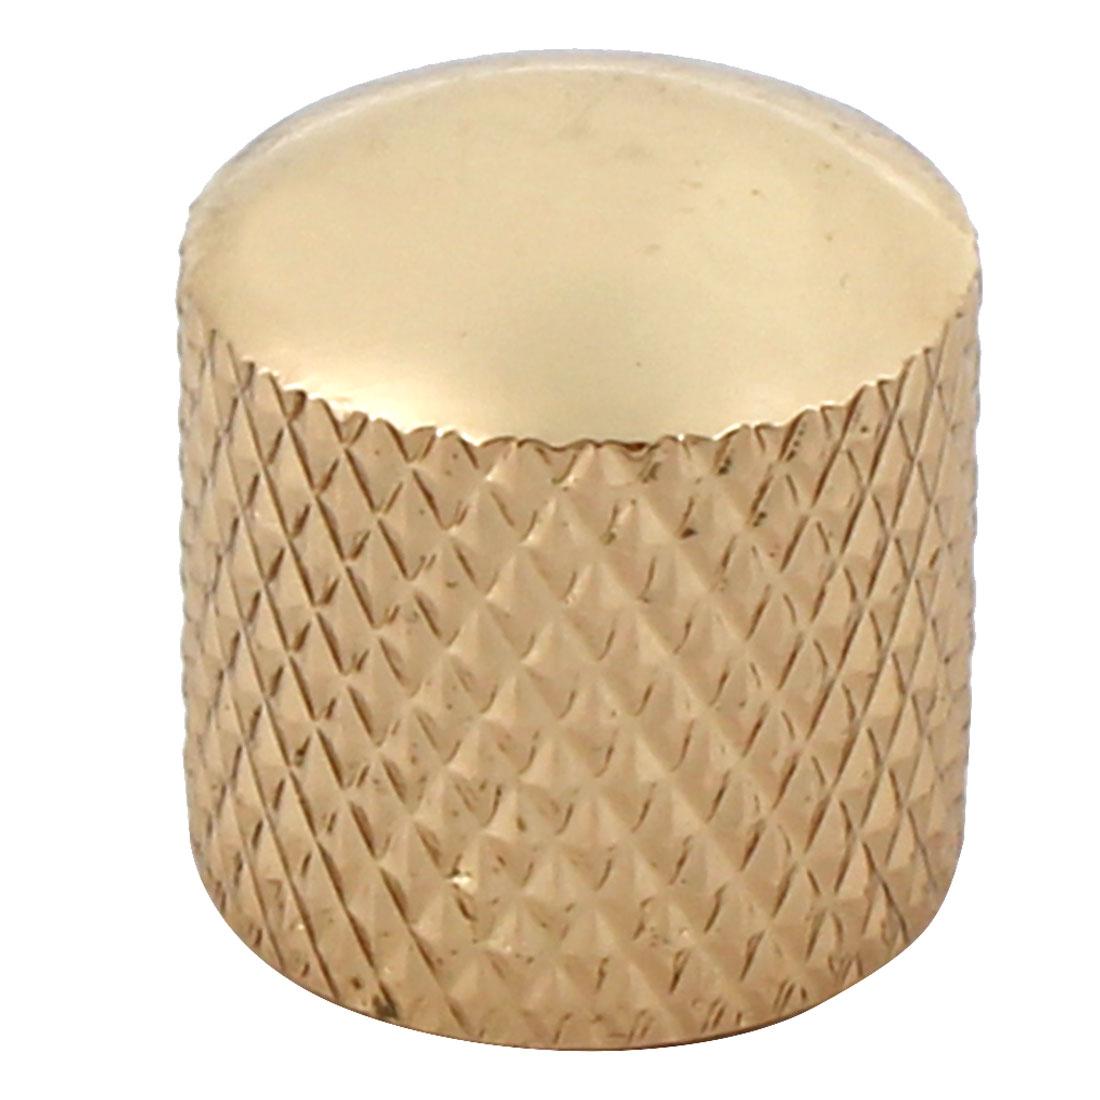 Electric Guitar Volume Tone Control Knob Top Hat Cylinder Shape Gold Tone